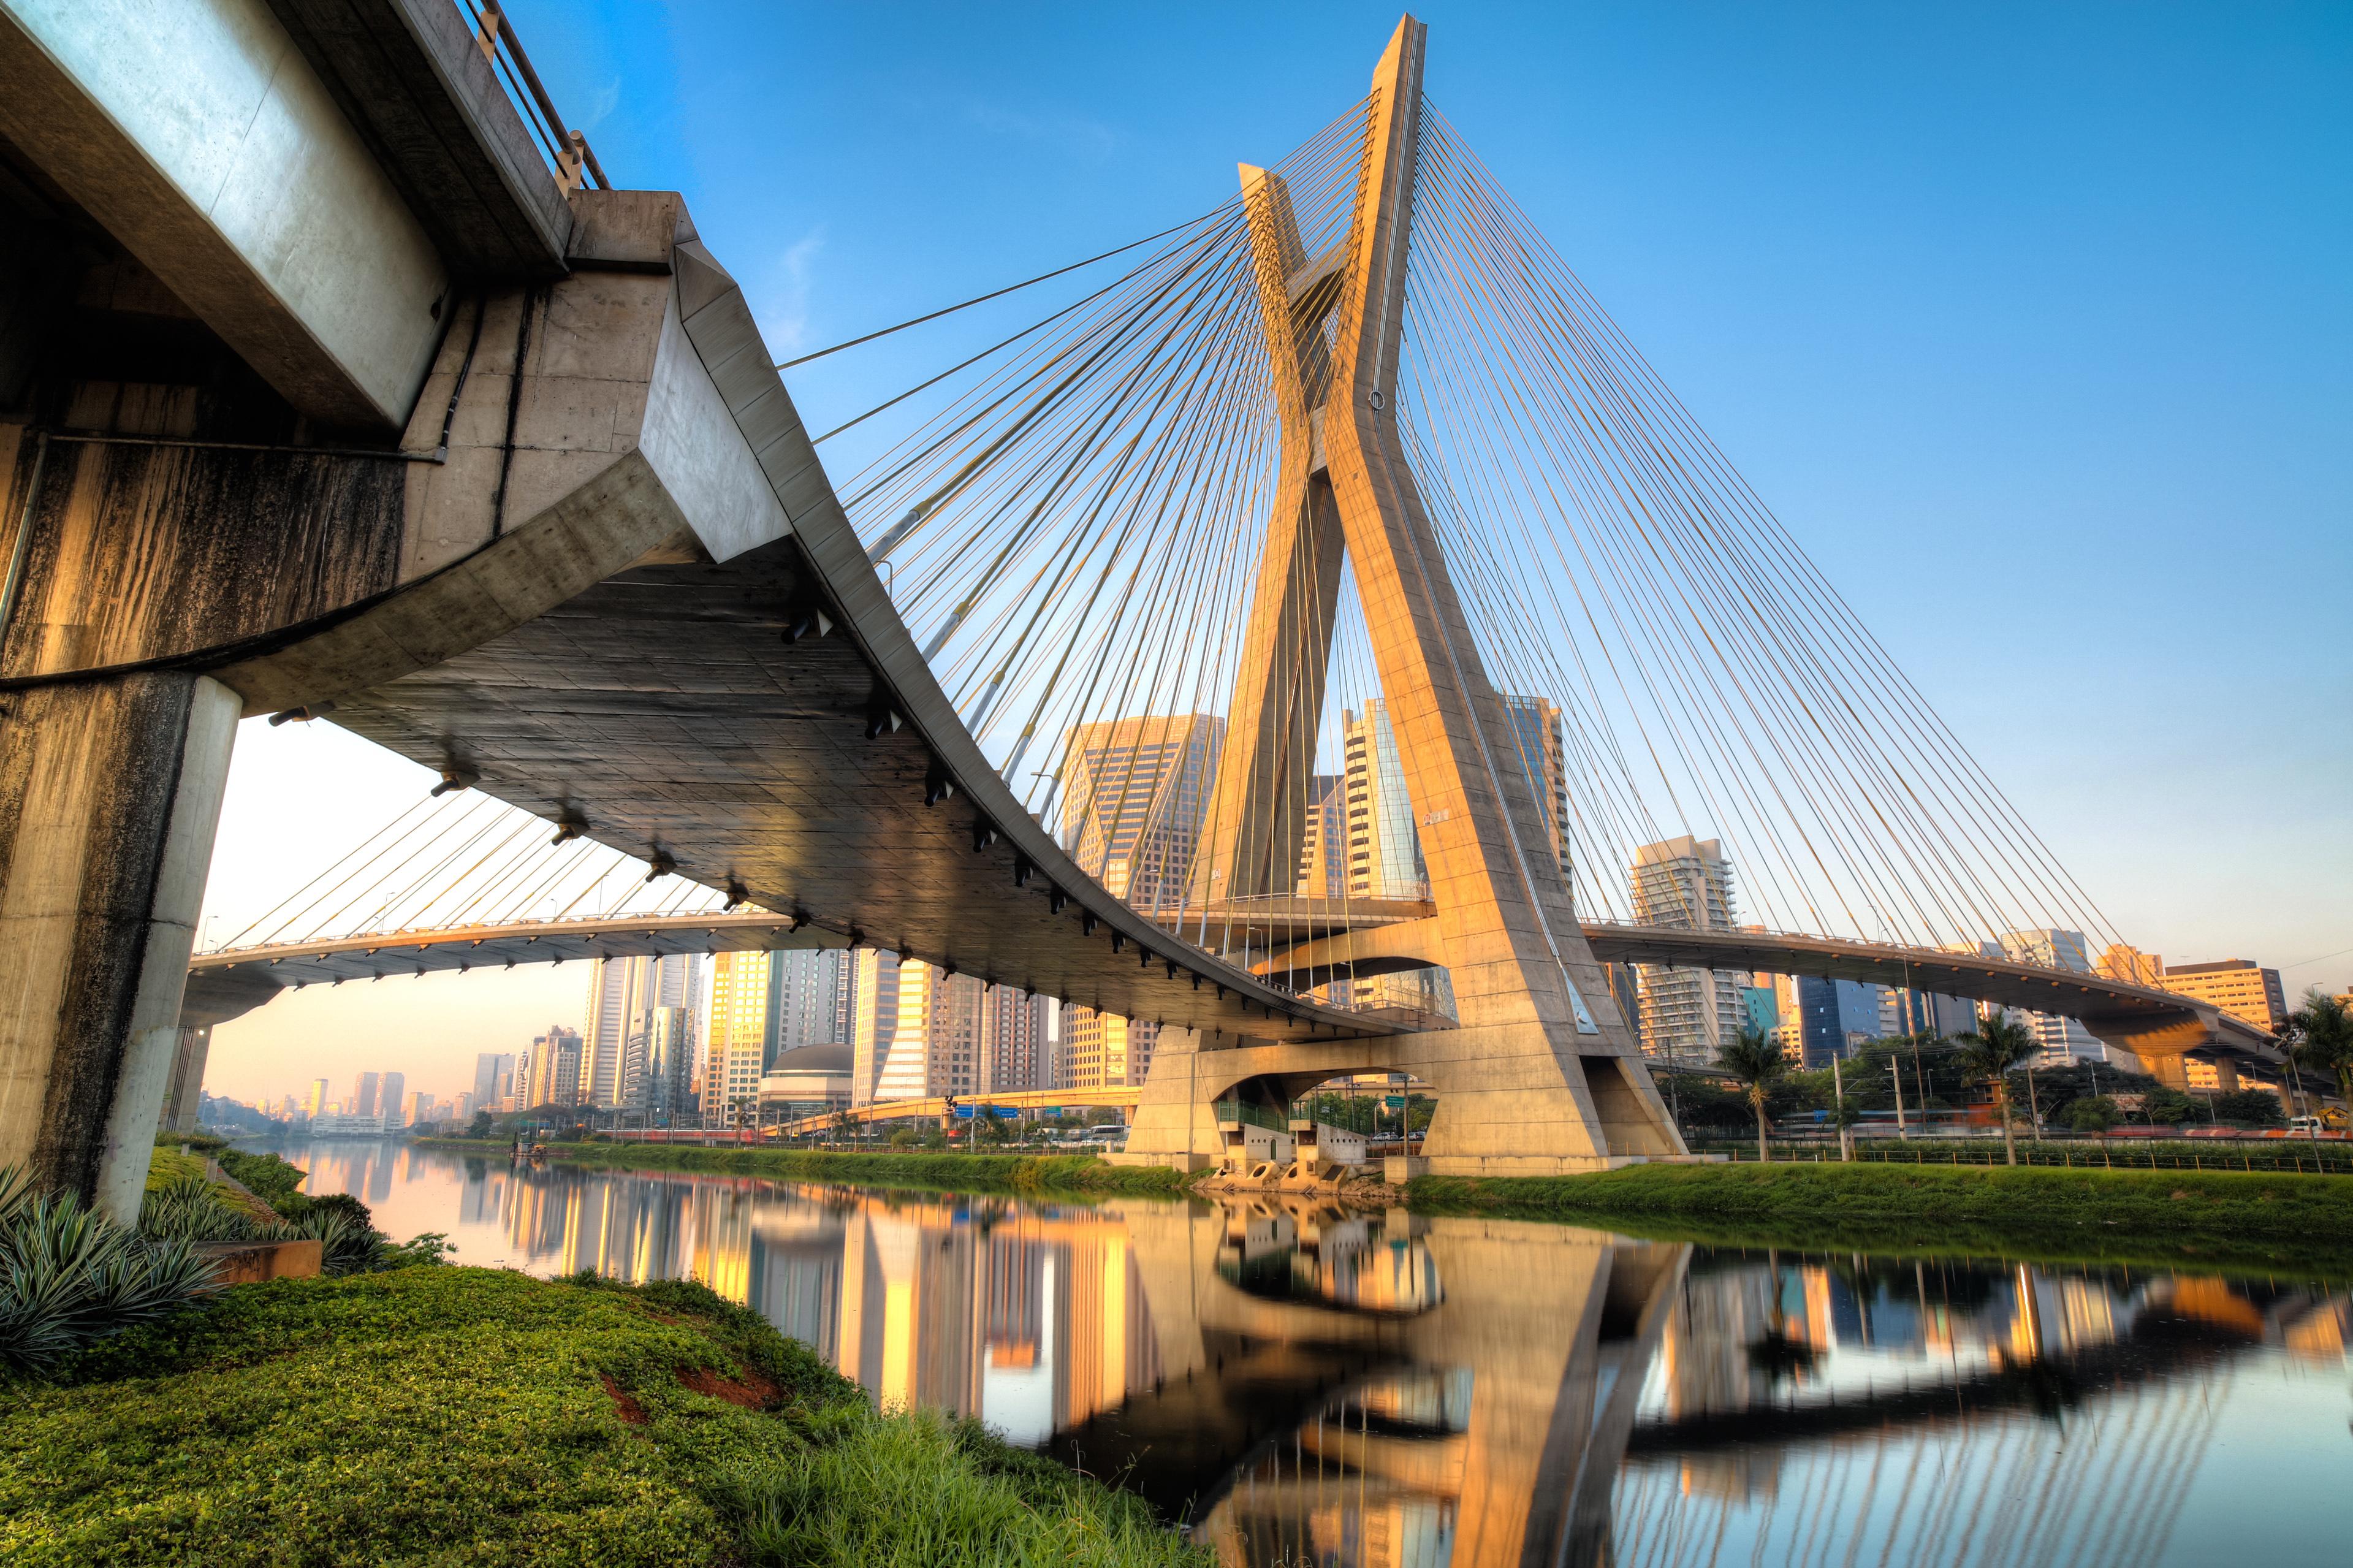 Midas Civil: Cable Stayed Bridge - Octávio Frias de Oliveira Bridge